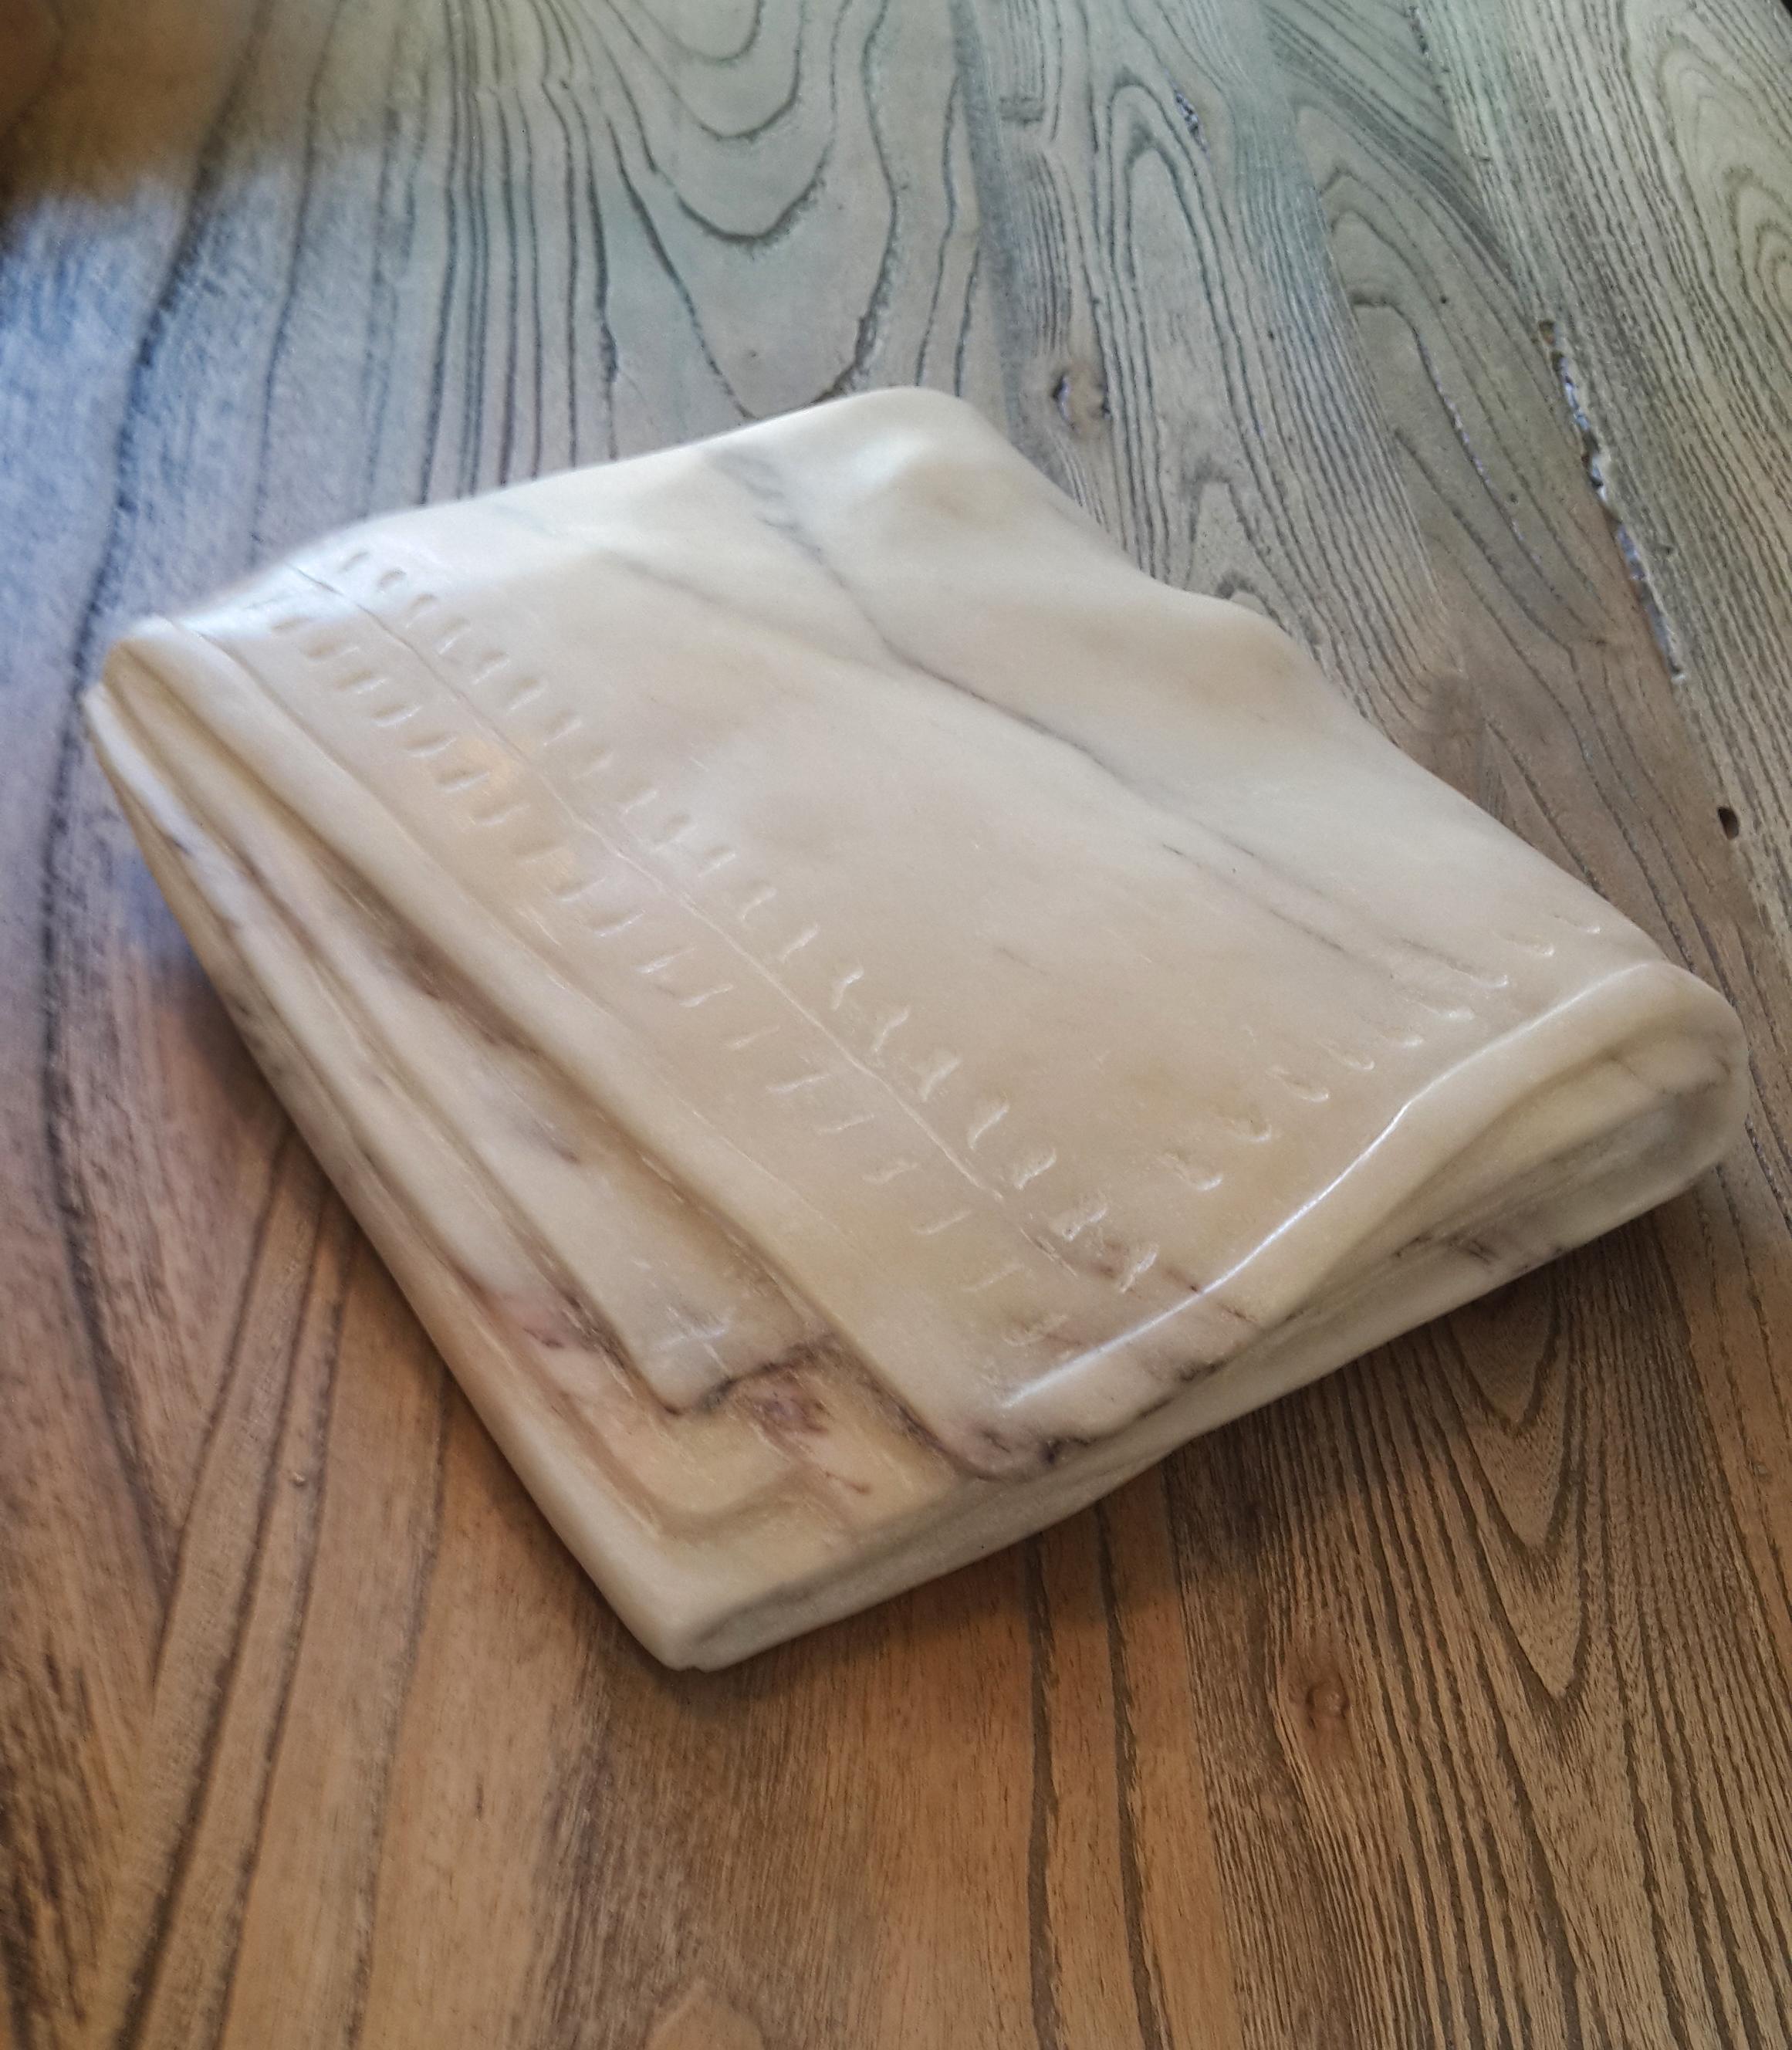 Towel/marble / 21x19